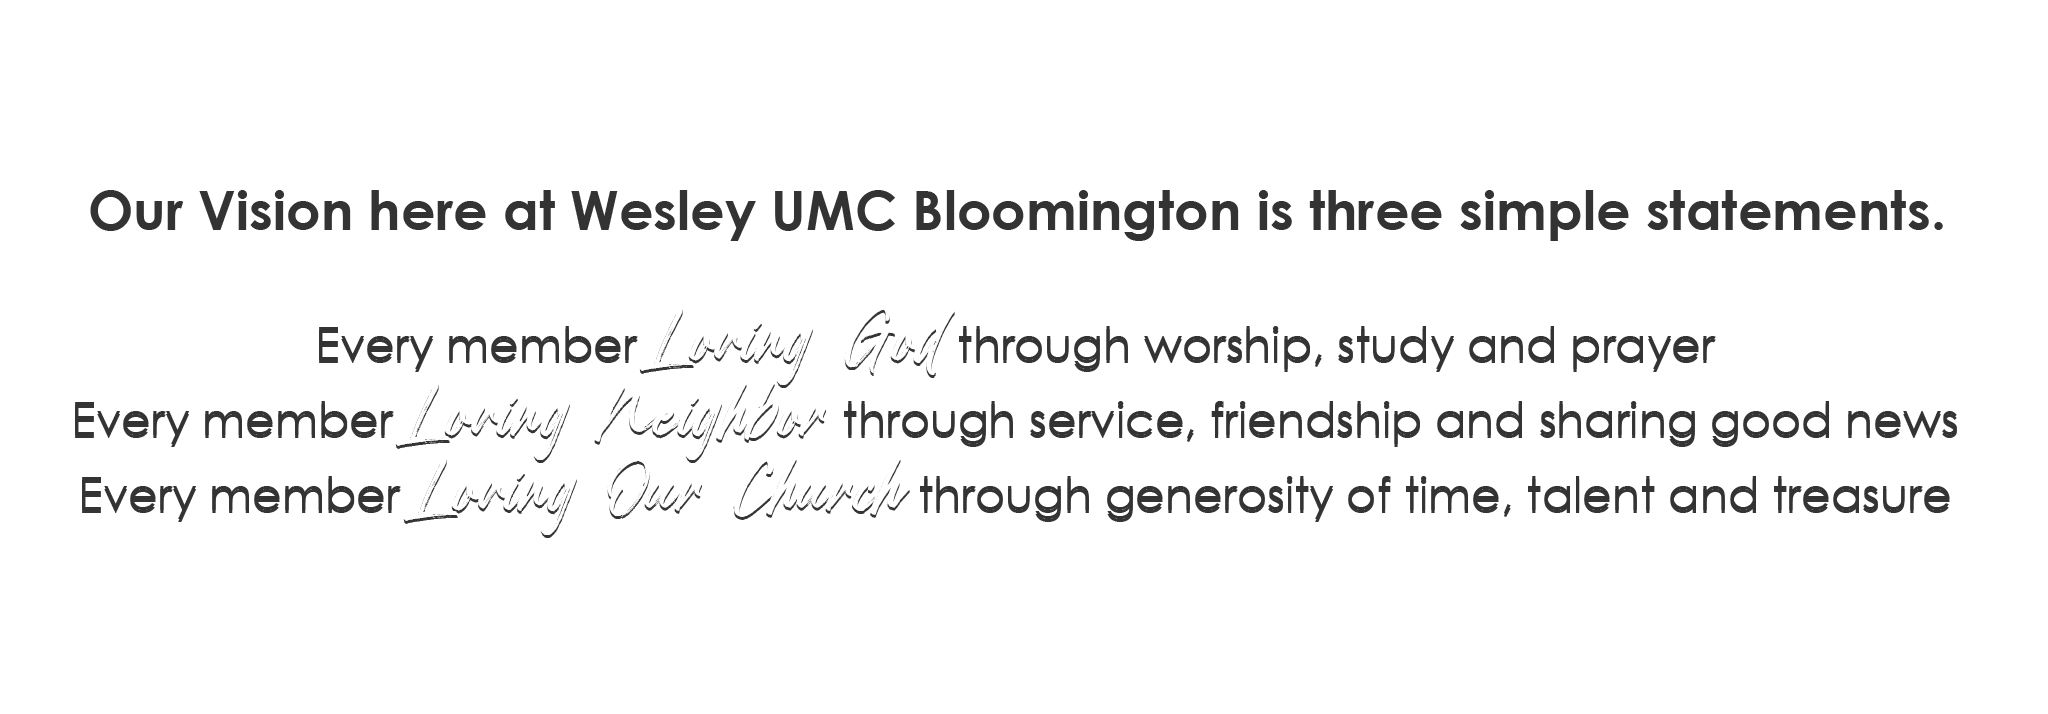 Wesley UMC Bloomington Vision Statement